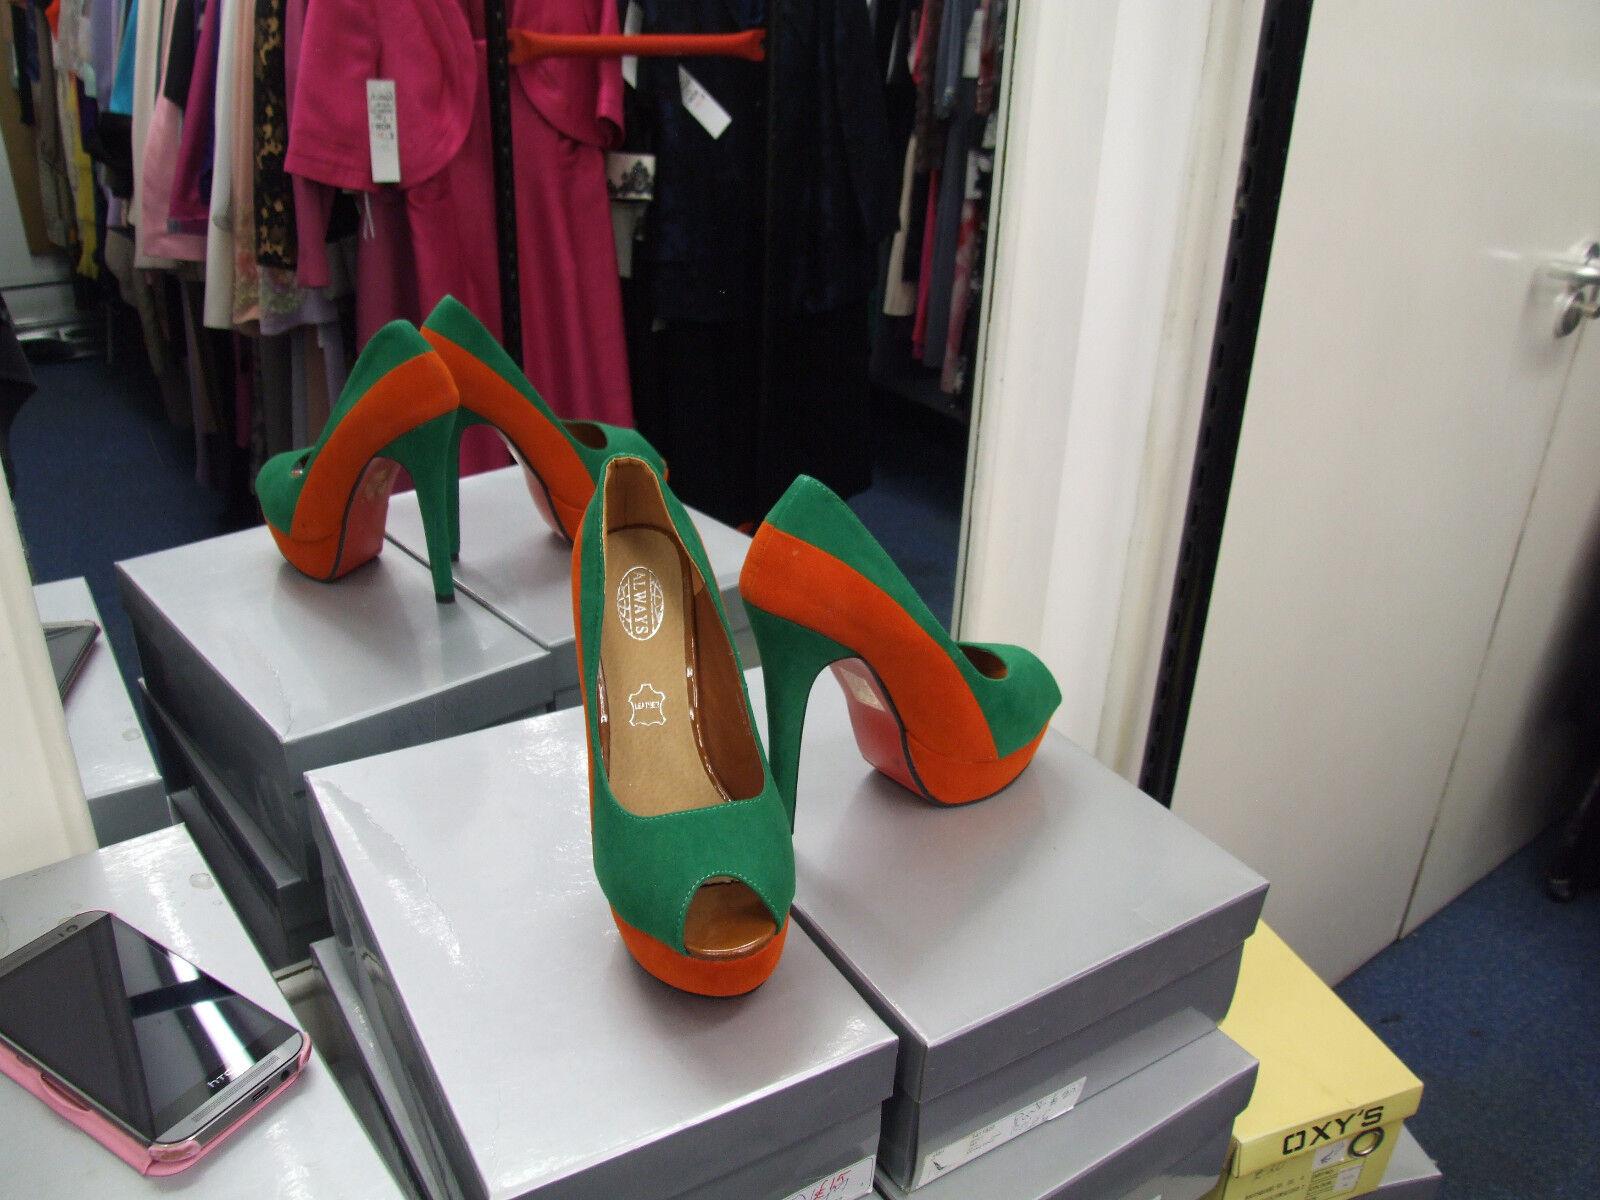 BNIB UK 3.5 Divine Green V. High Heel Emerald Green Divine & Ruset Peep Toe Suede Shoes EU 36 906fa5